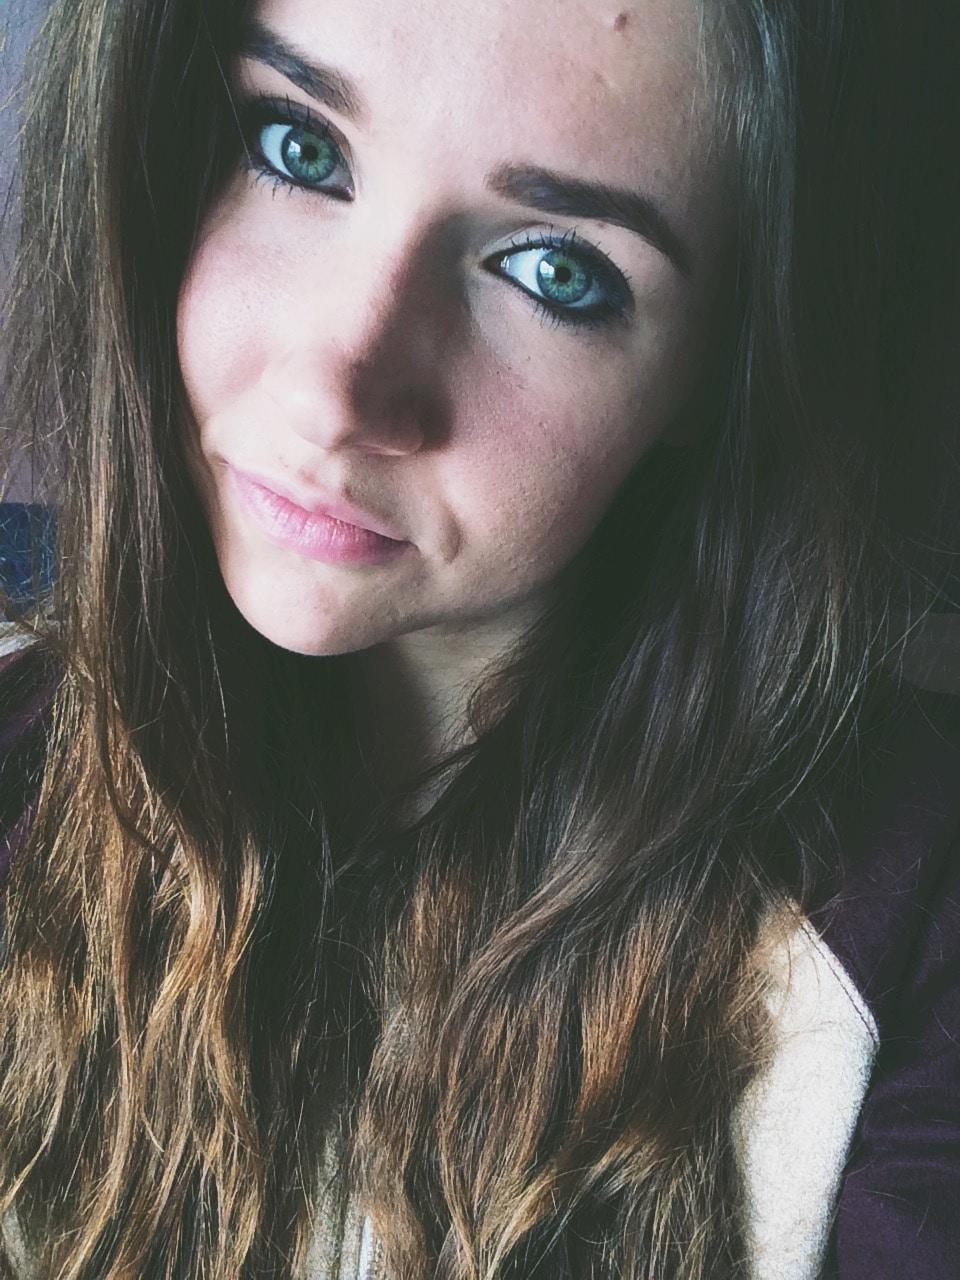 Go to Ashley Nikole's profile